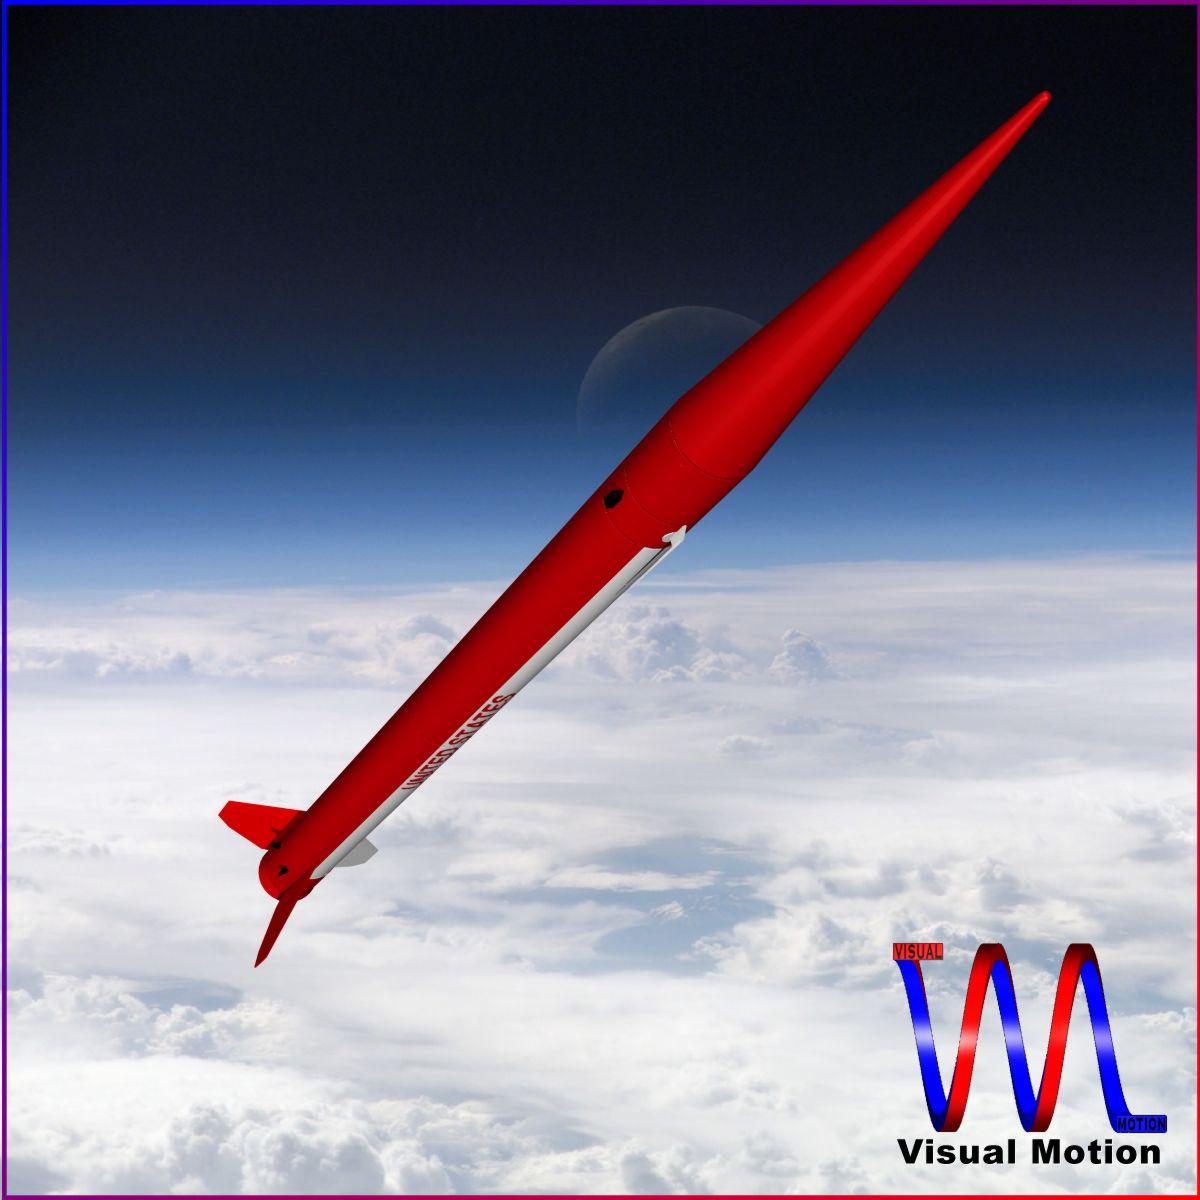 хар хун III пуужин 3d загвар 3ds дууг сонсогдож dxf cob x obj 150815